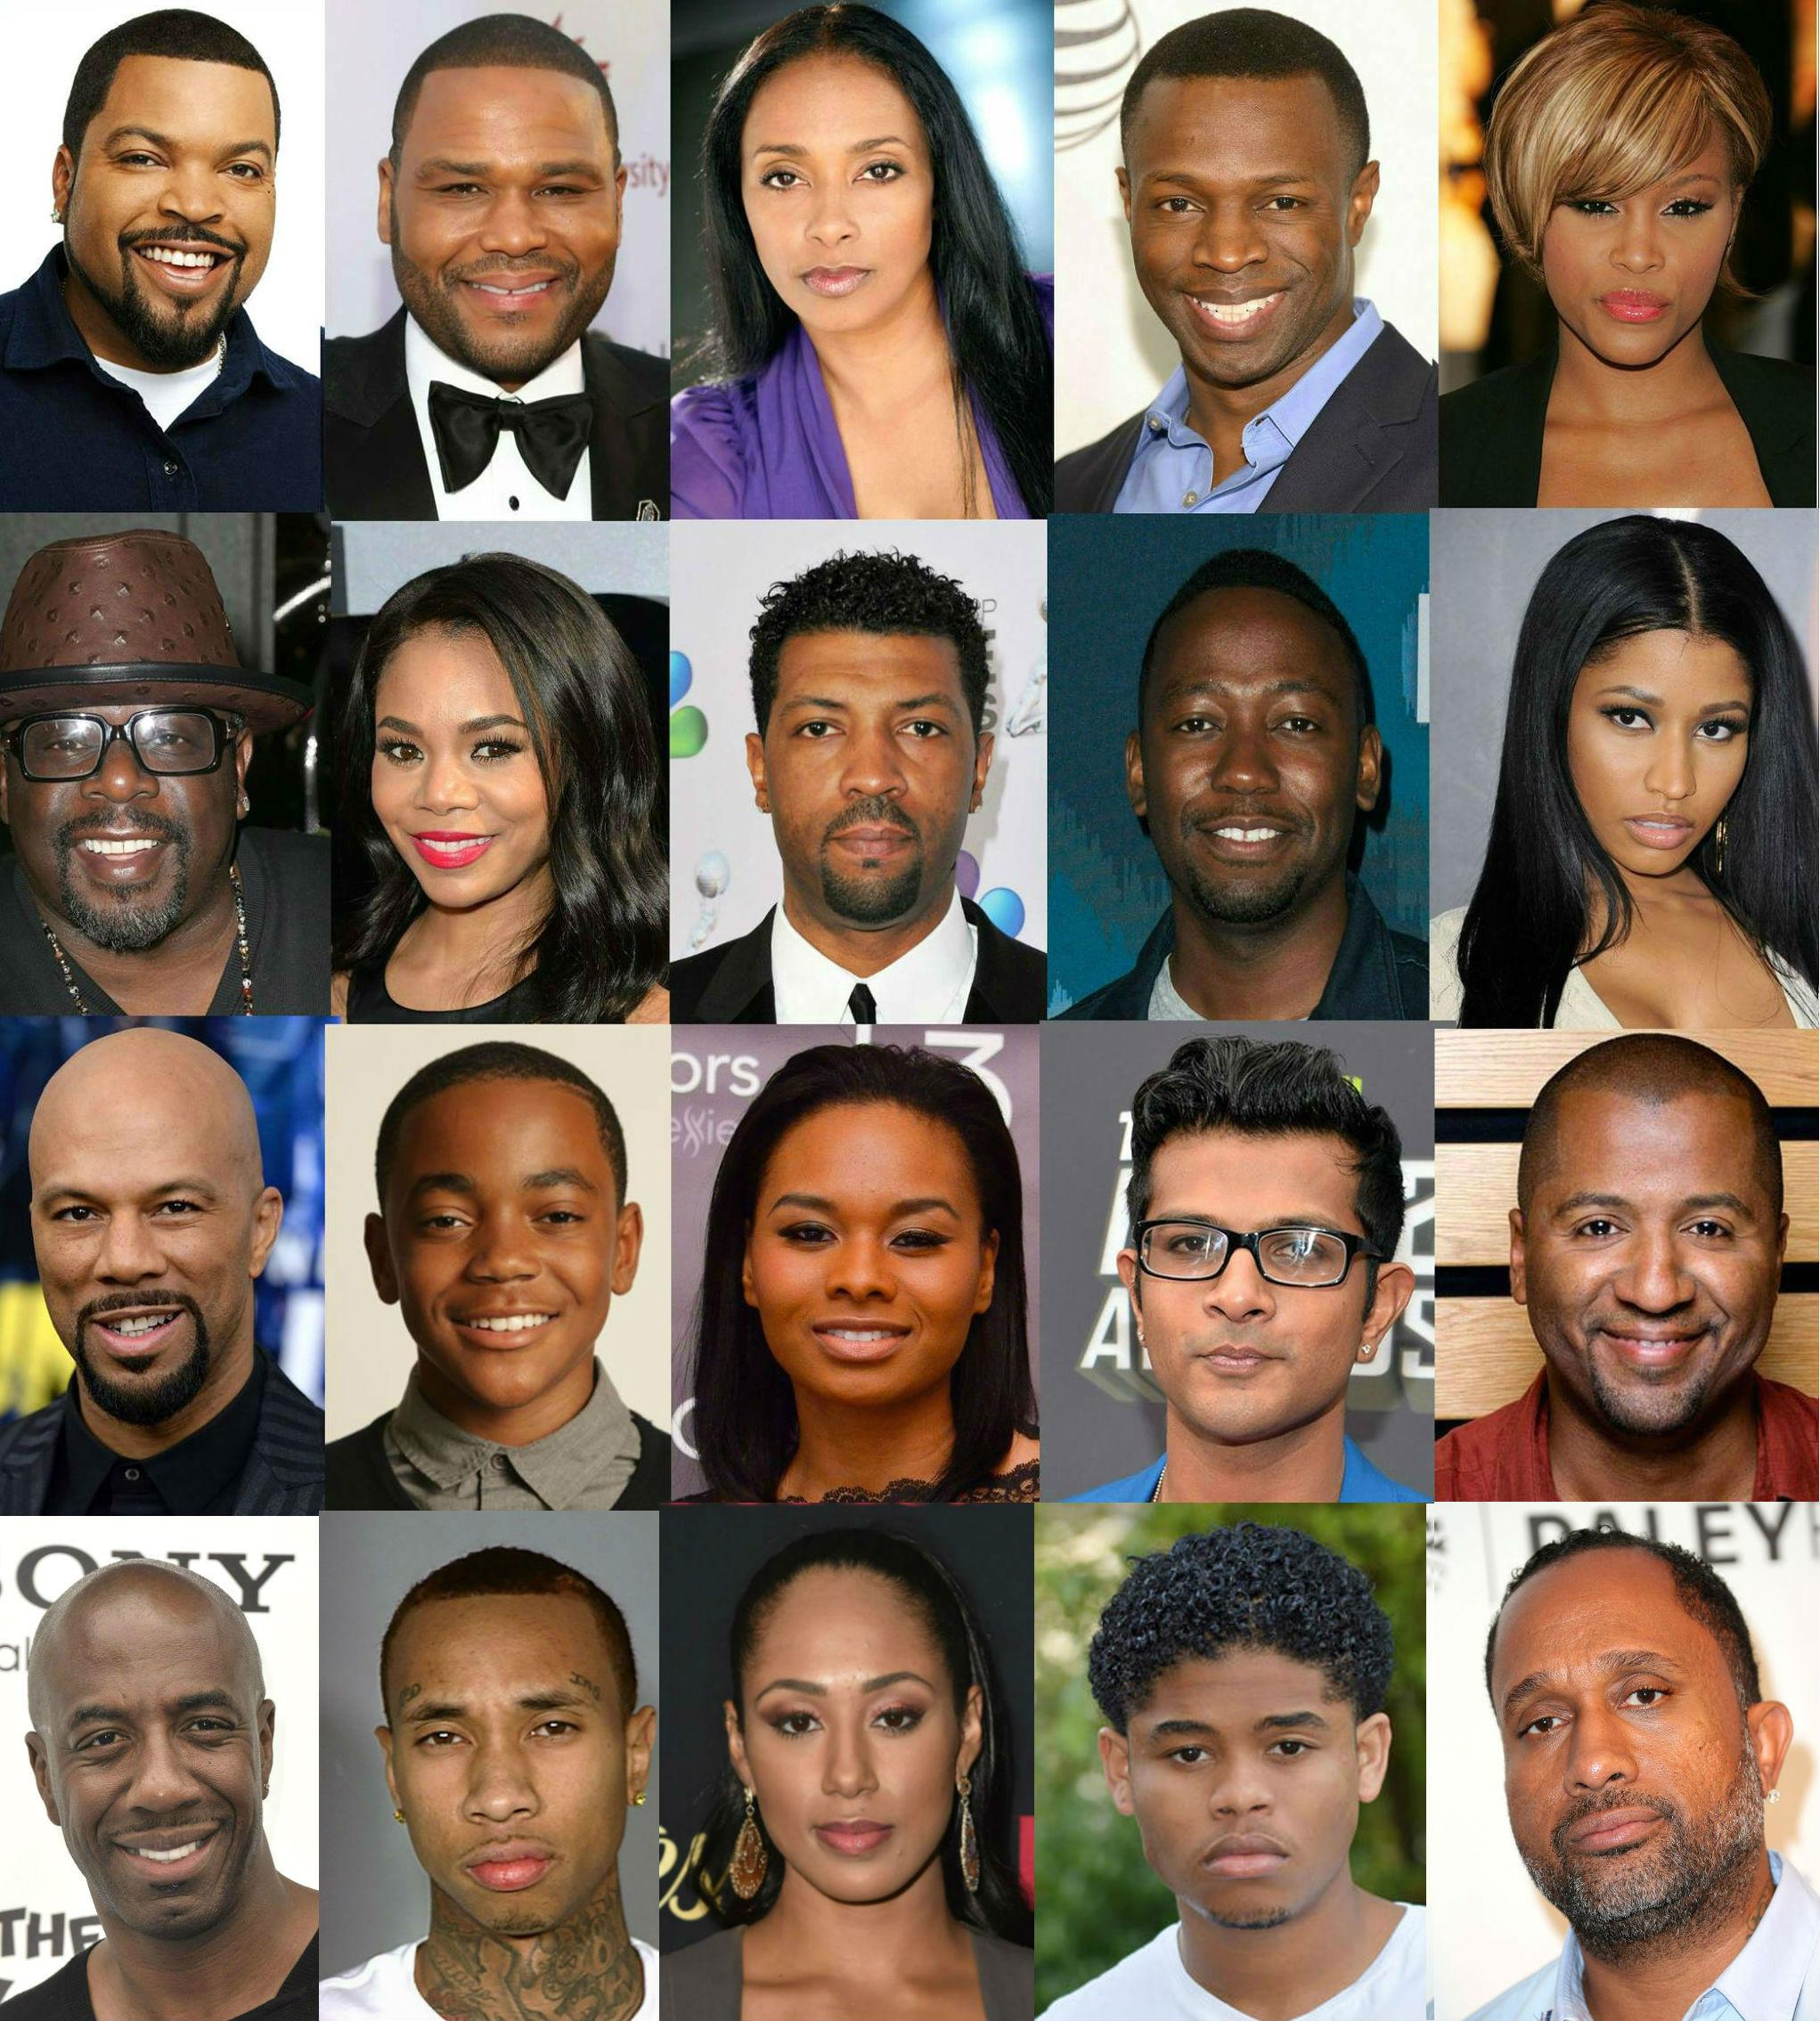 Barbershop 3 : Barbershop 3 2015 cast